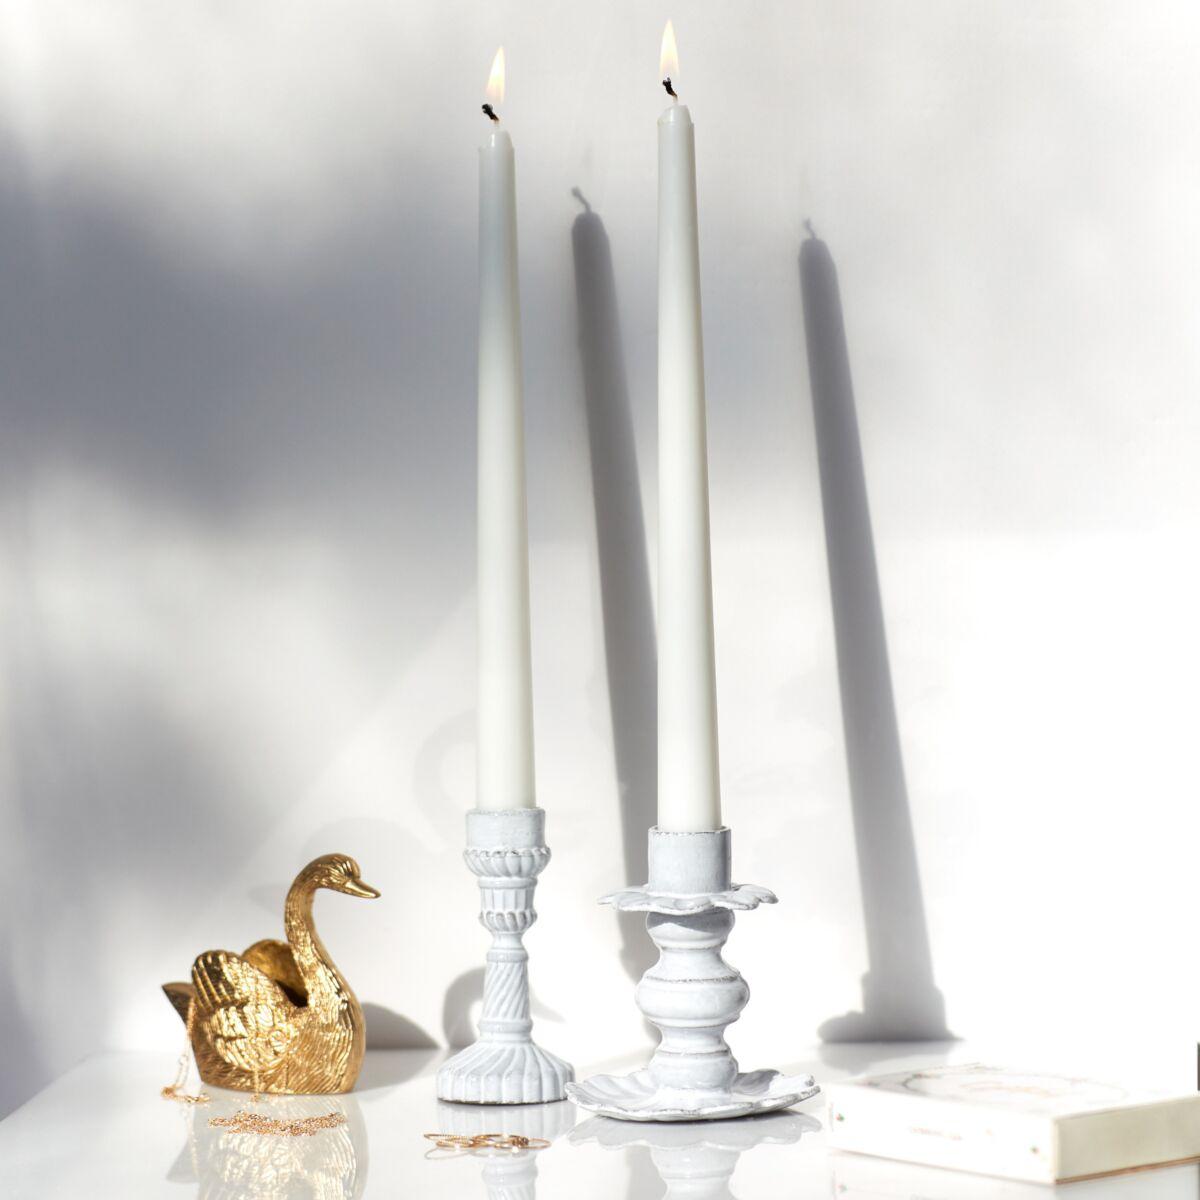 Fifi Candlestick image